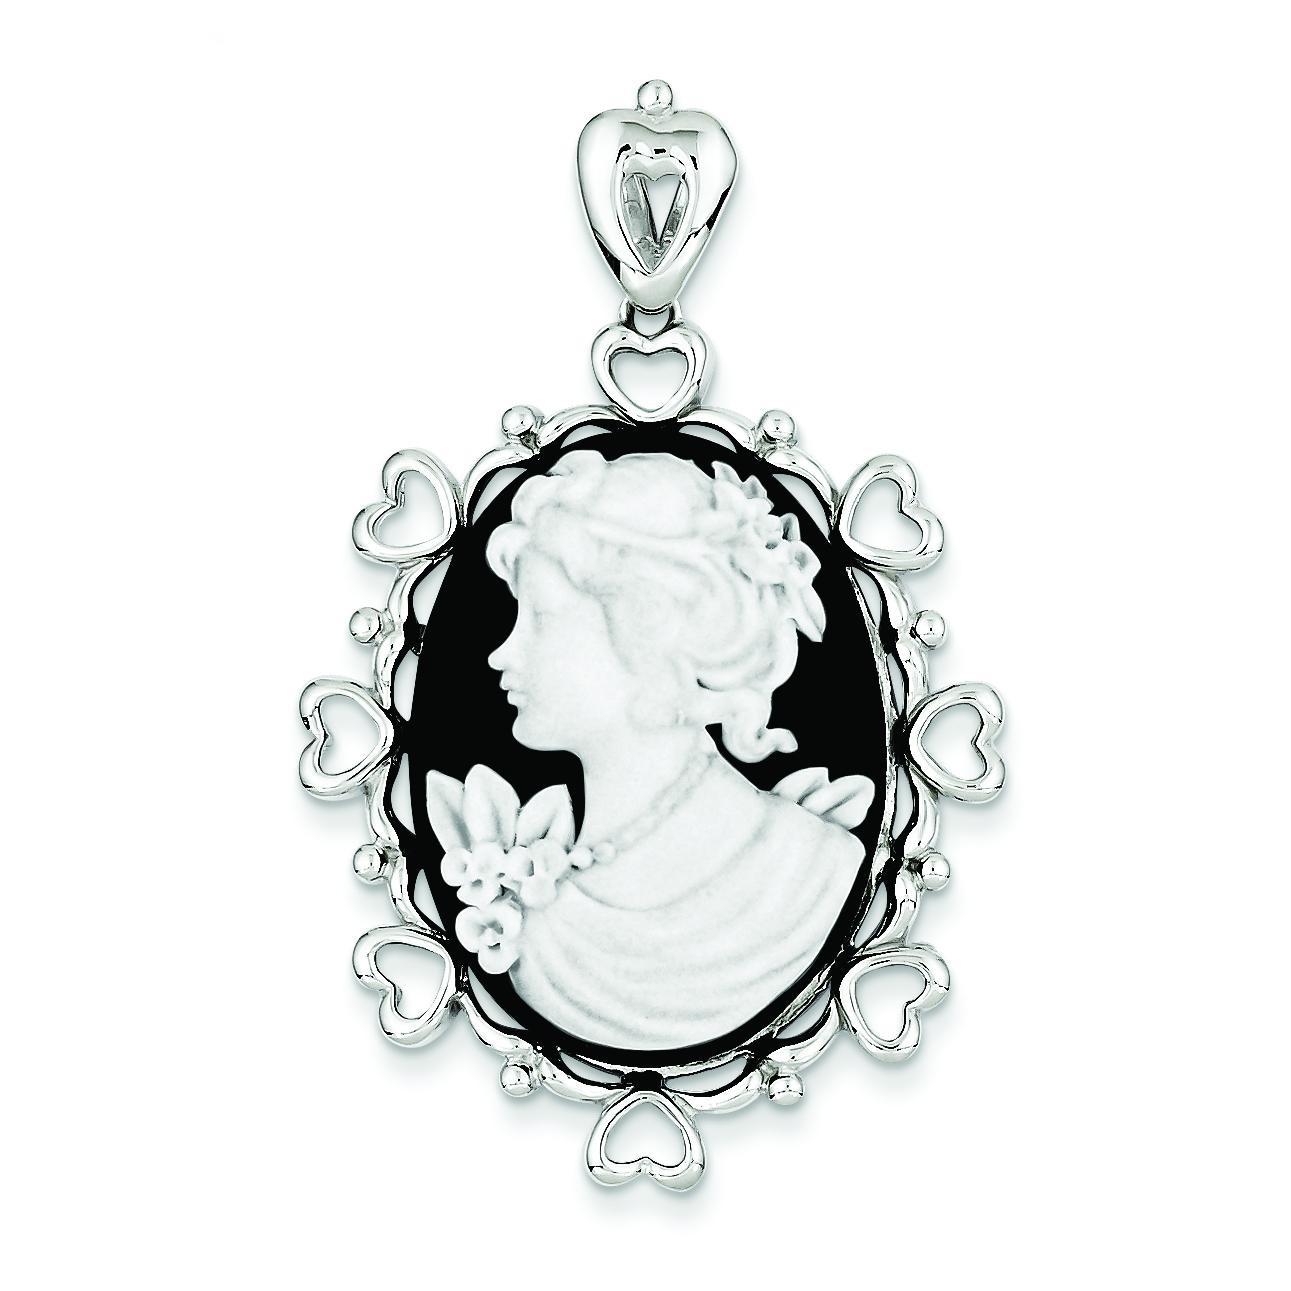 Black White Pendant in Sterling Silver